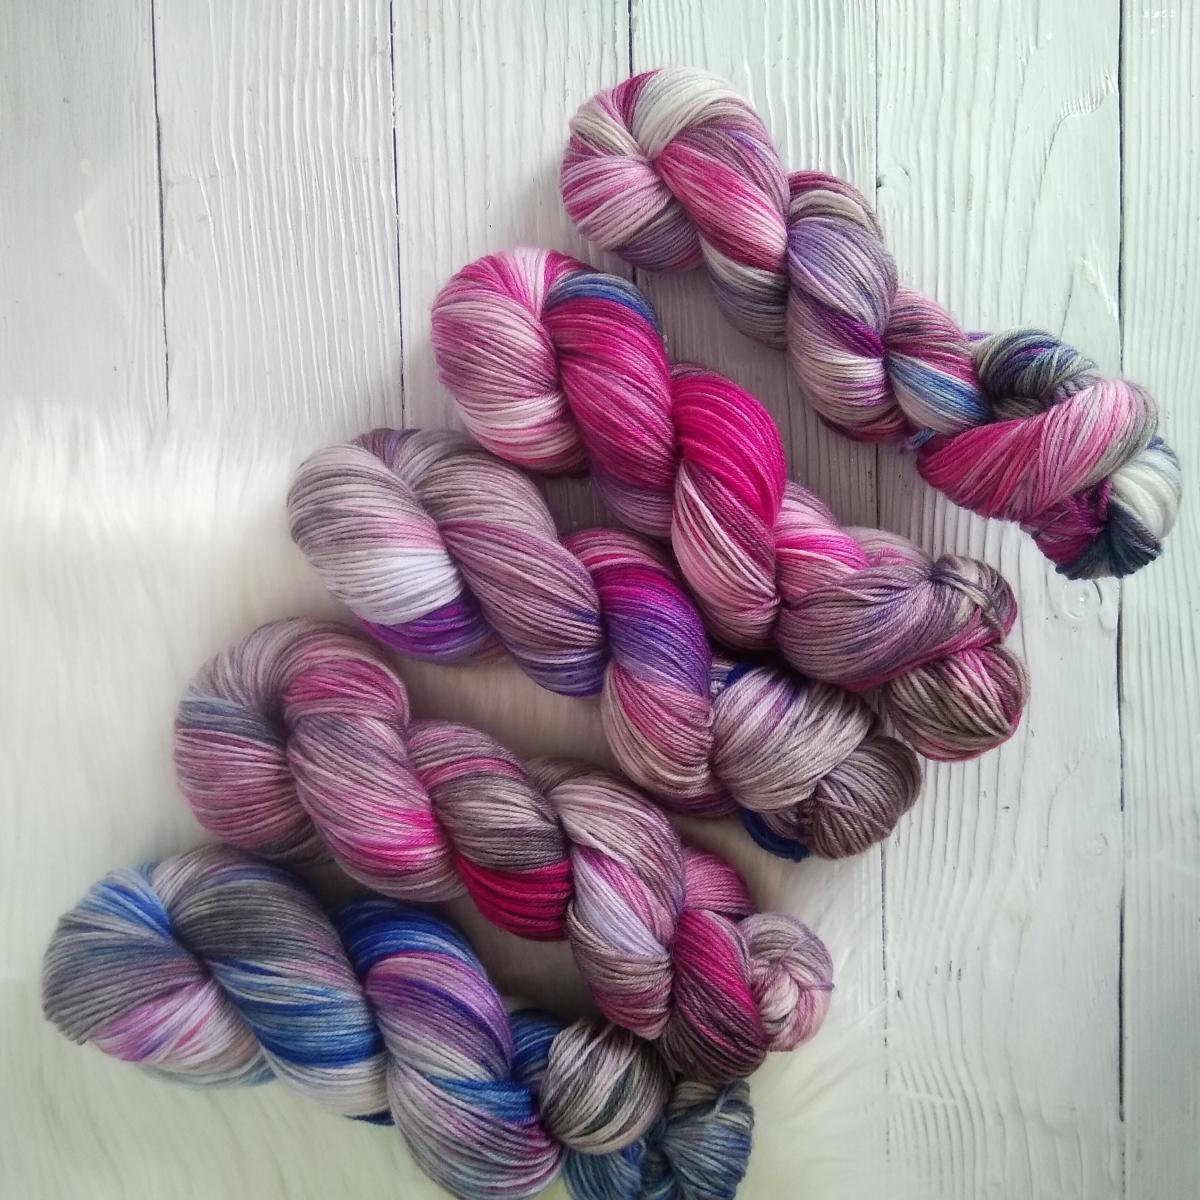 woodico.pro hand dyed yarn 034 5 1200x1200 - Hand dyed yarn / 034